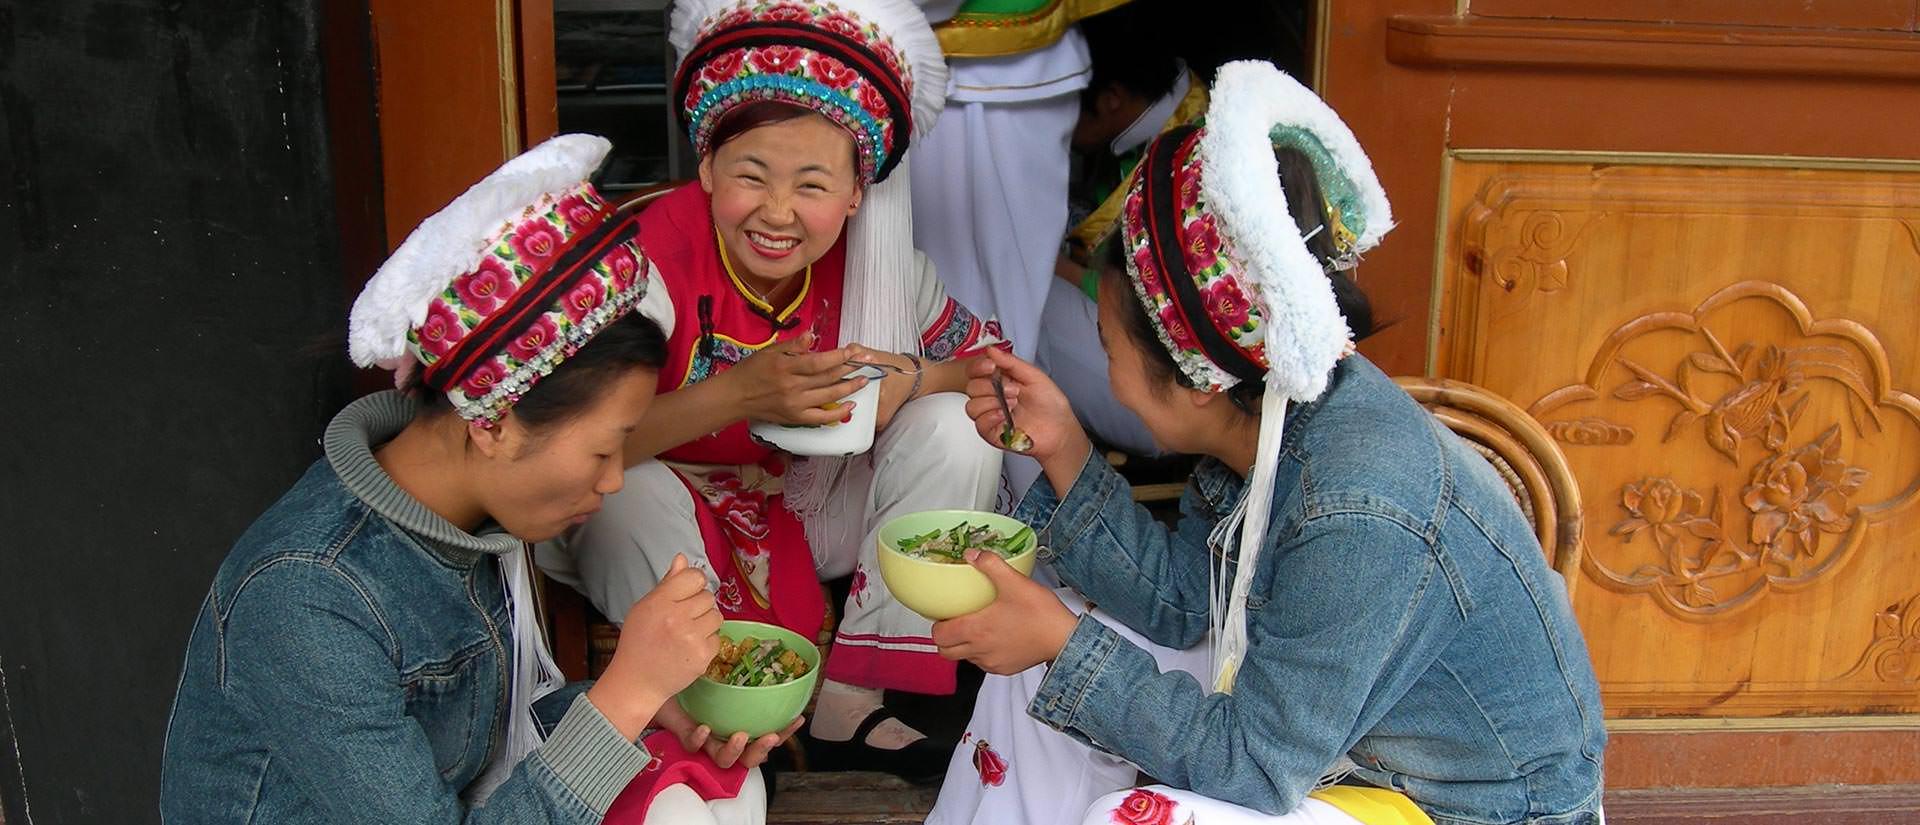 אוכל רחוב בסין